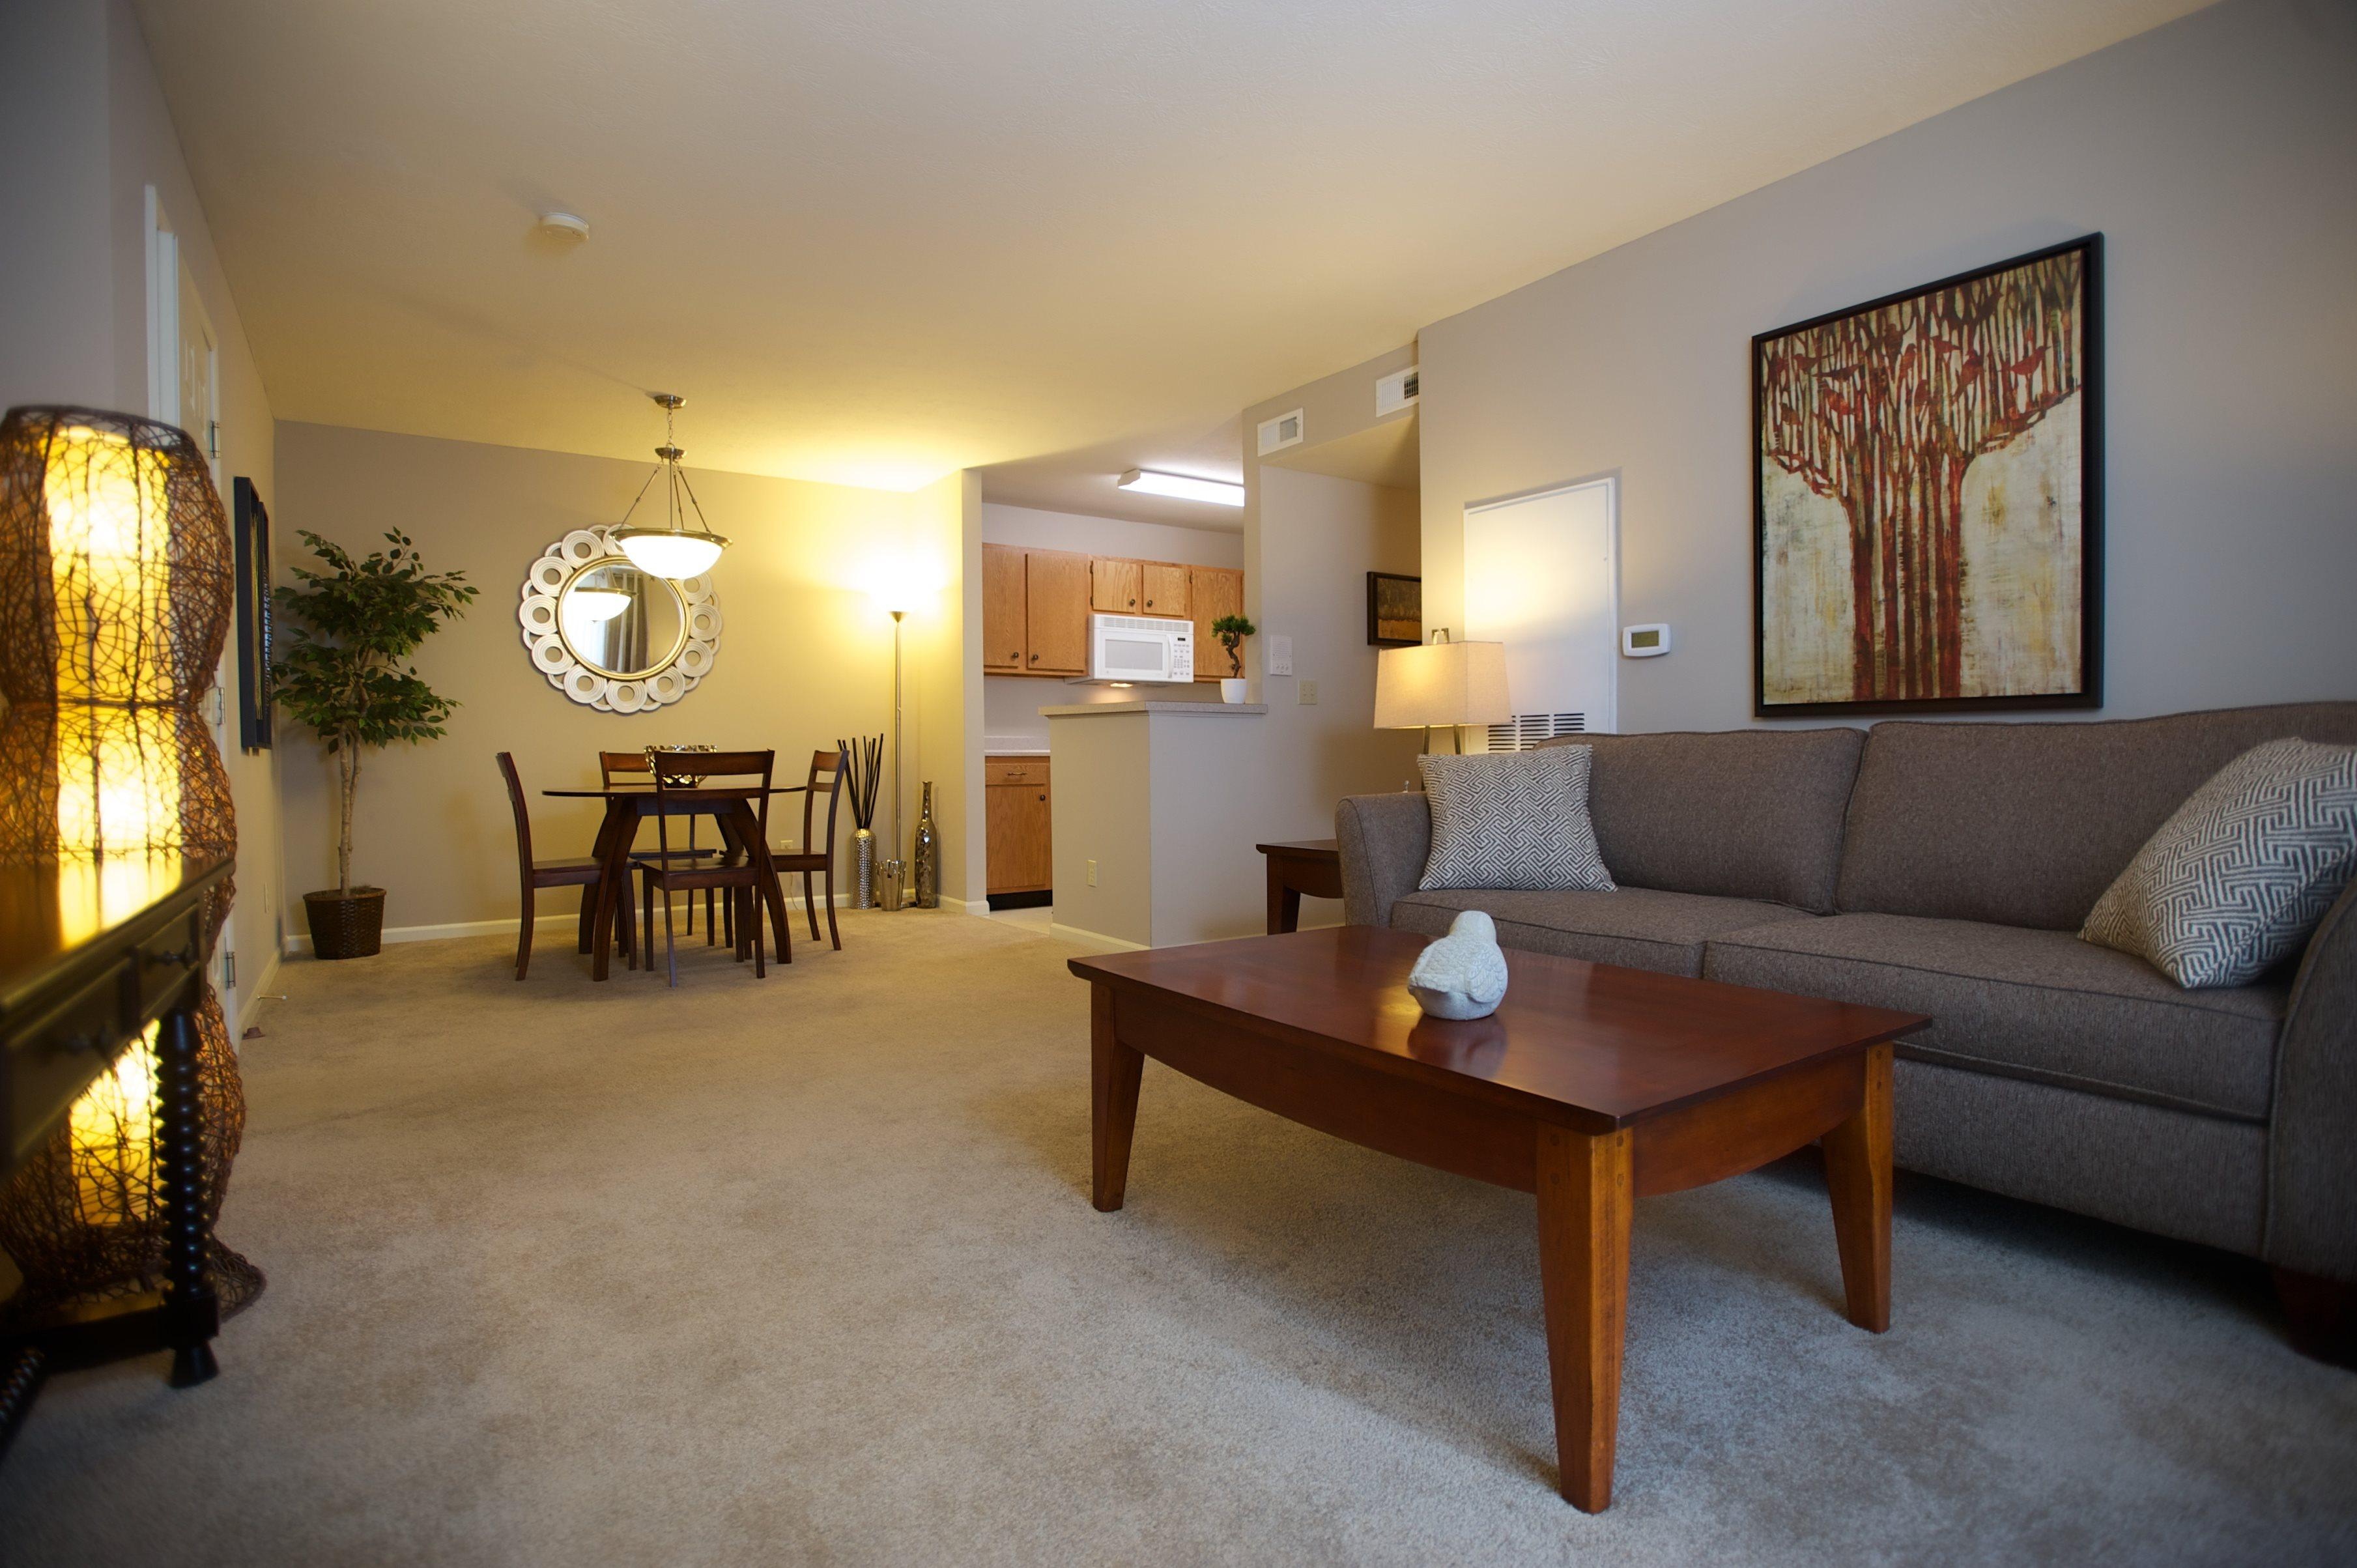 Plush Carpeted Floors at Arbors of Lebanon Apartments in Lebanon, Ohio